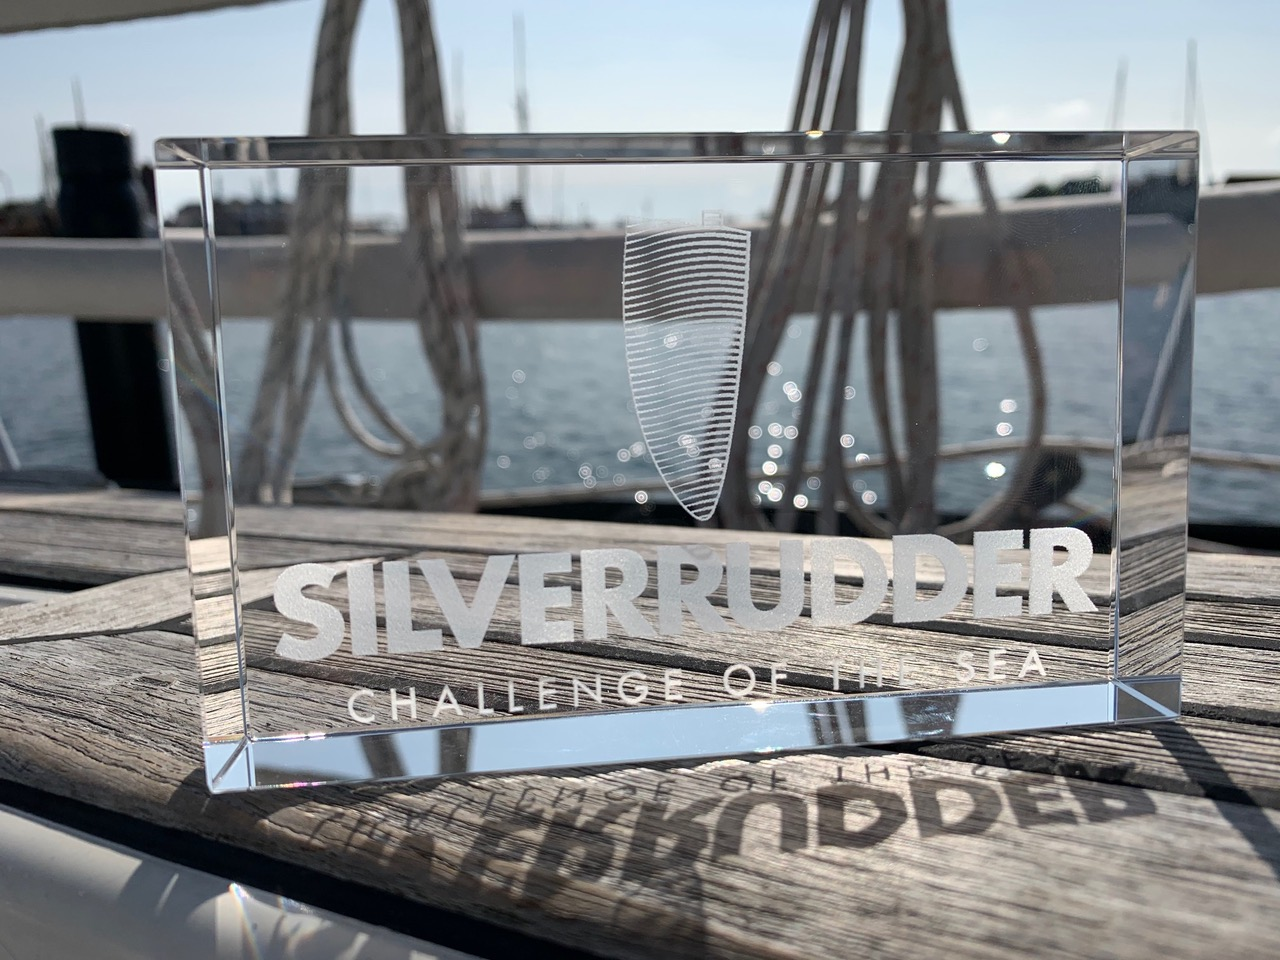 Silverrudder 2020 | X-382 Xusidus